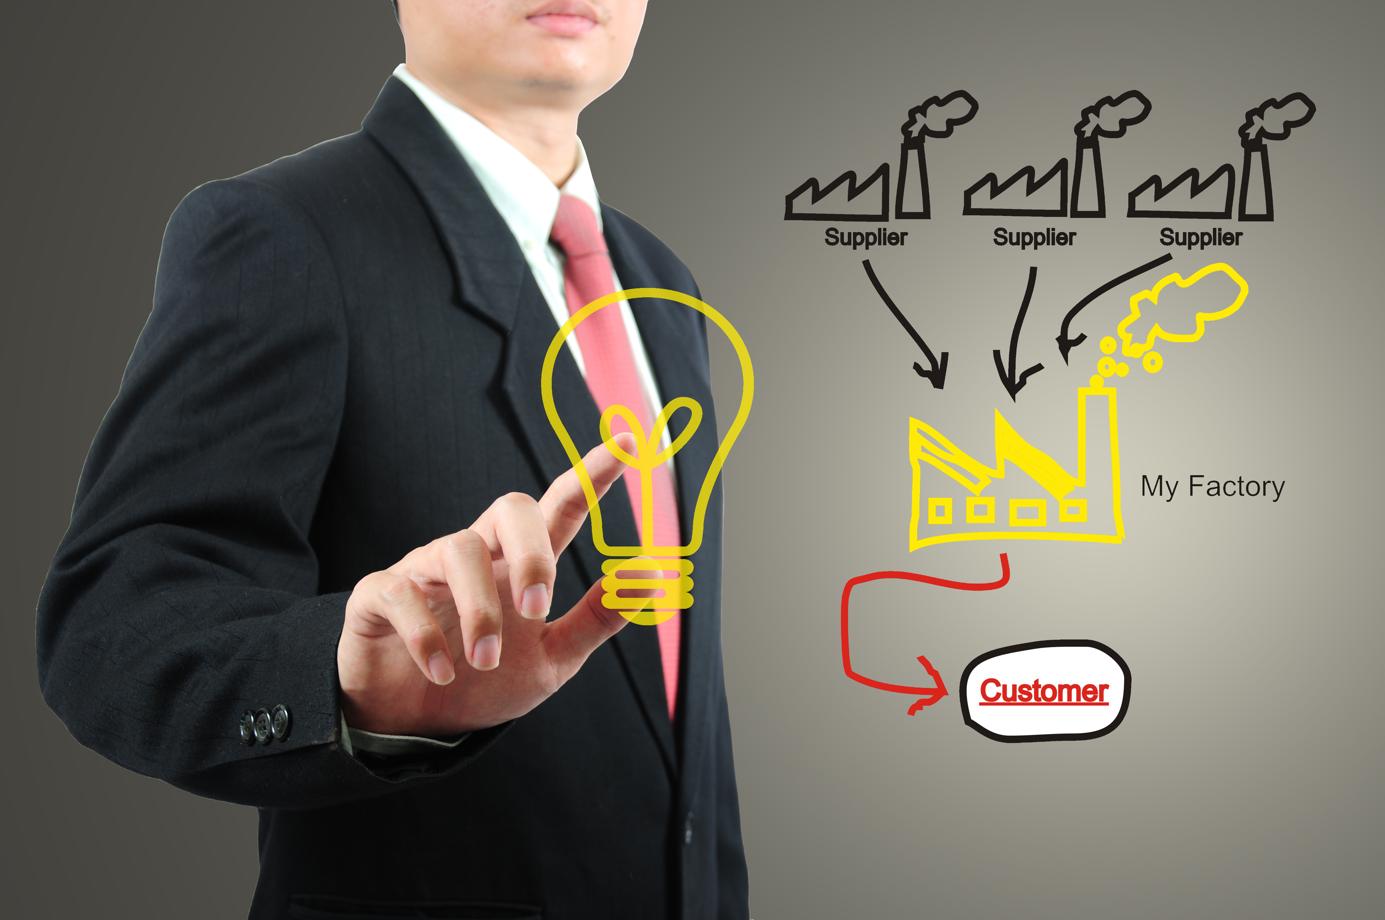 ... Deutschland - Executive Search, Supply Chain Logistik, Lean Six Sigma